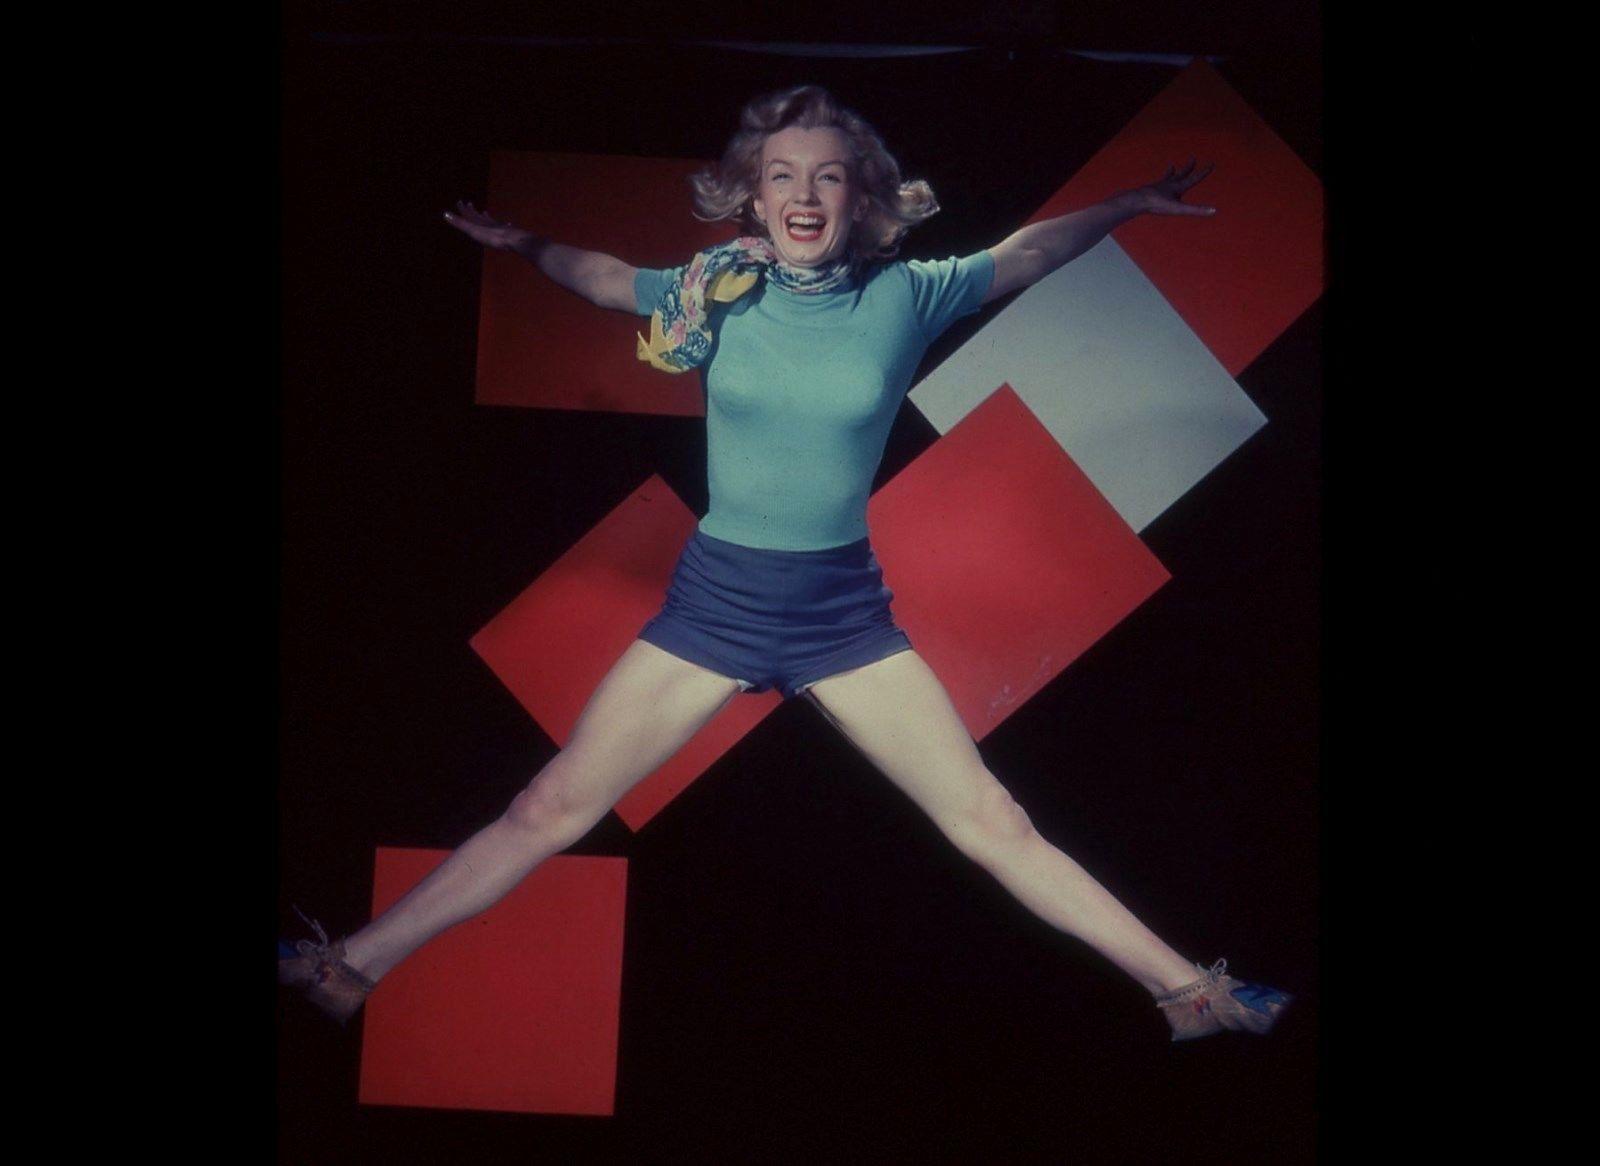 Marilyn Monroe, 1948 or 1949 by Willinger